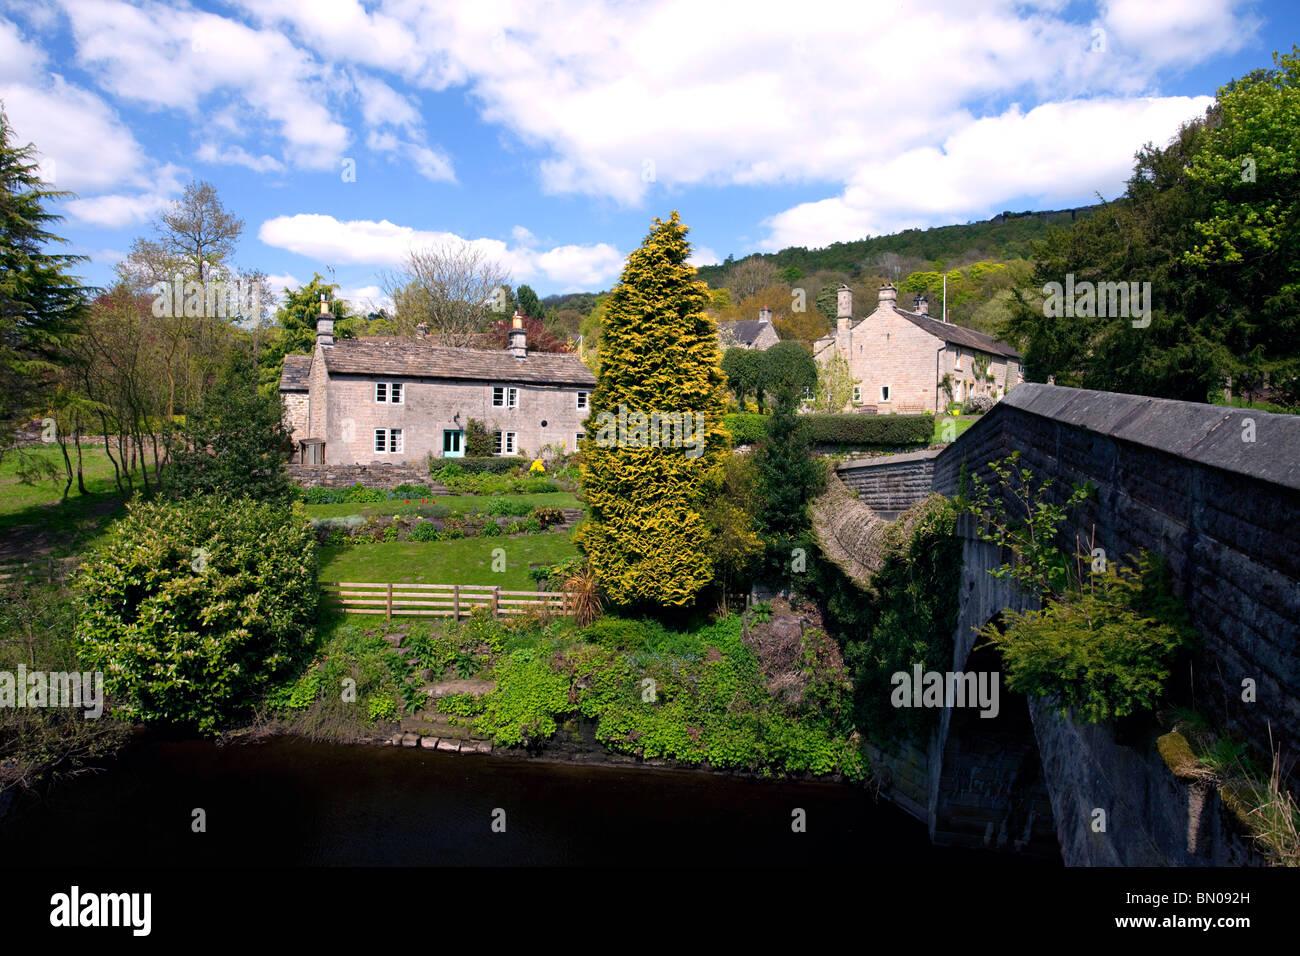 View from Froggatt bridge in the Derbyshire Peak District National Park England United Kingdom - Stock Image